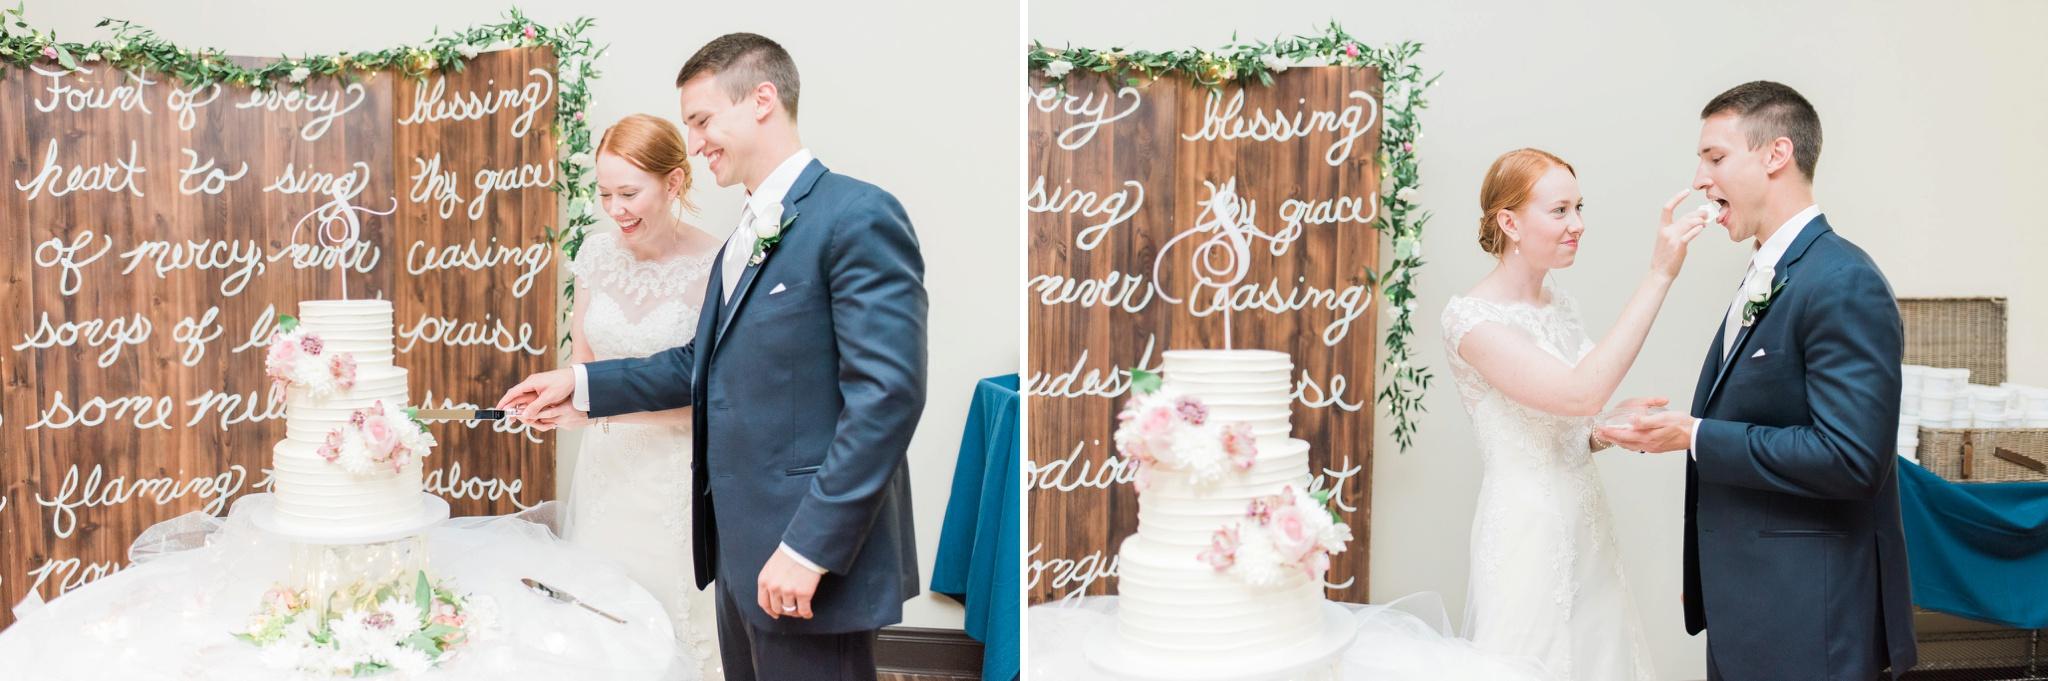 sunbury-ohio-wedding-hannah-johnathan_0133.jpg